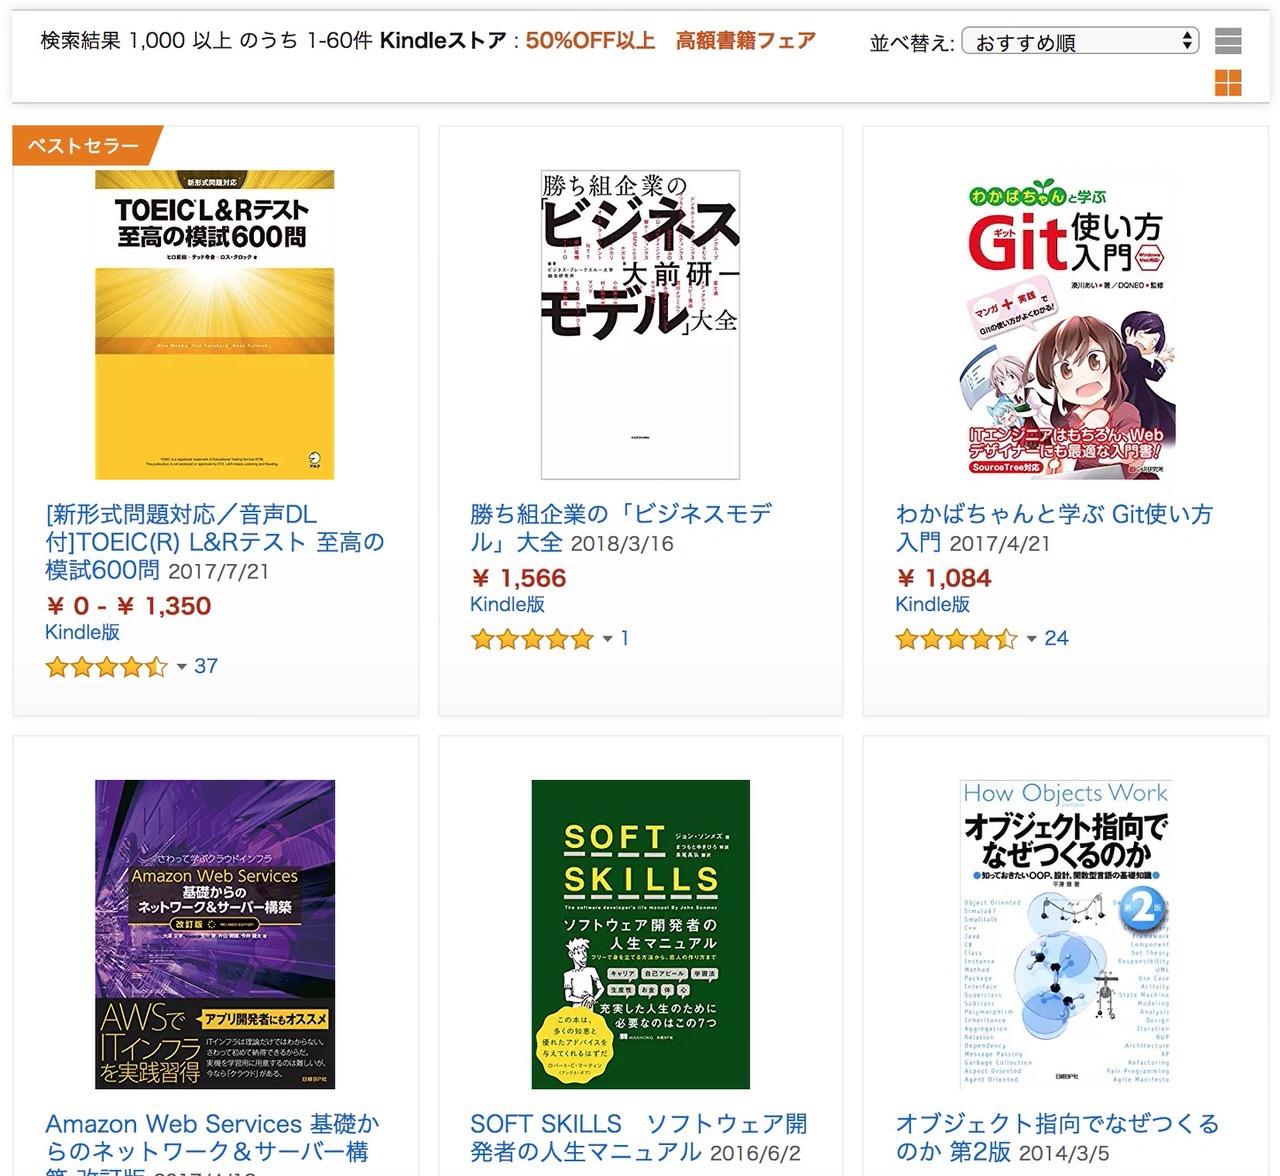 【Kindleセール】技術書多し!50%OFF以上「高額書籍フェア」(5/31まで)